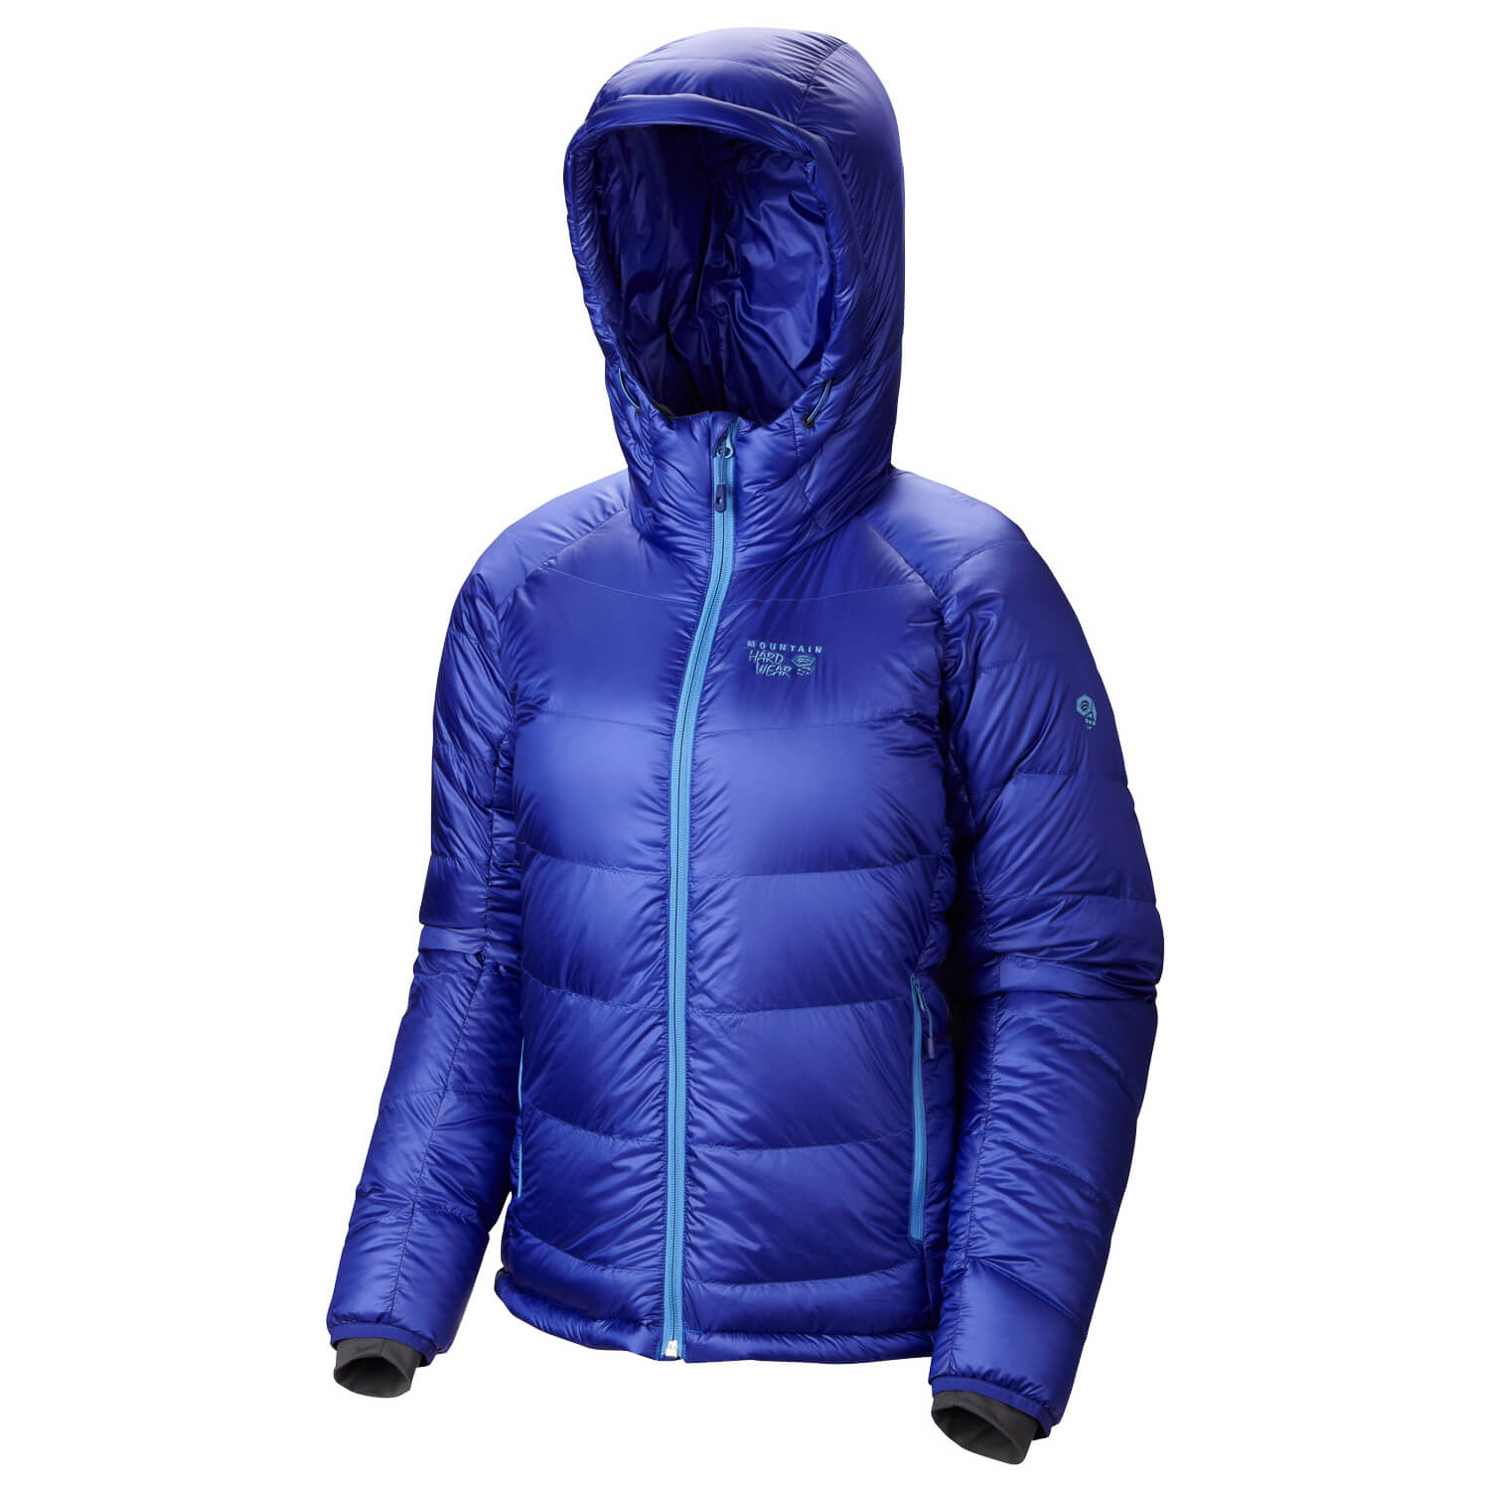 online retailer a7e92 a0338 Mountain Hardwear Phantom Hooded Down Jacket - Giacca in ...